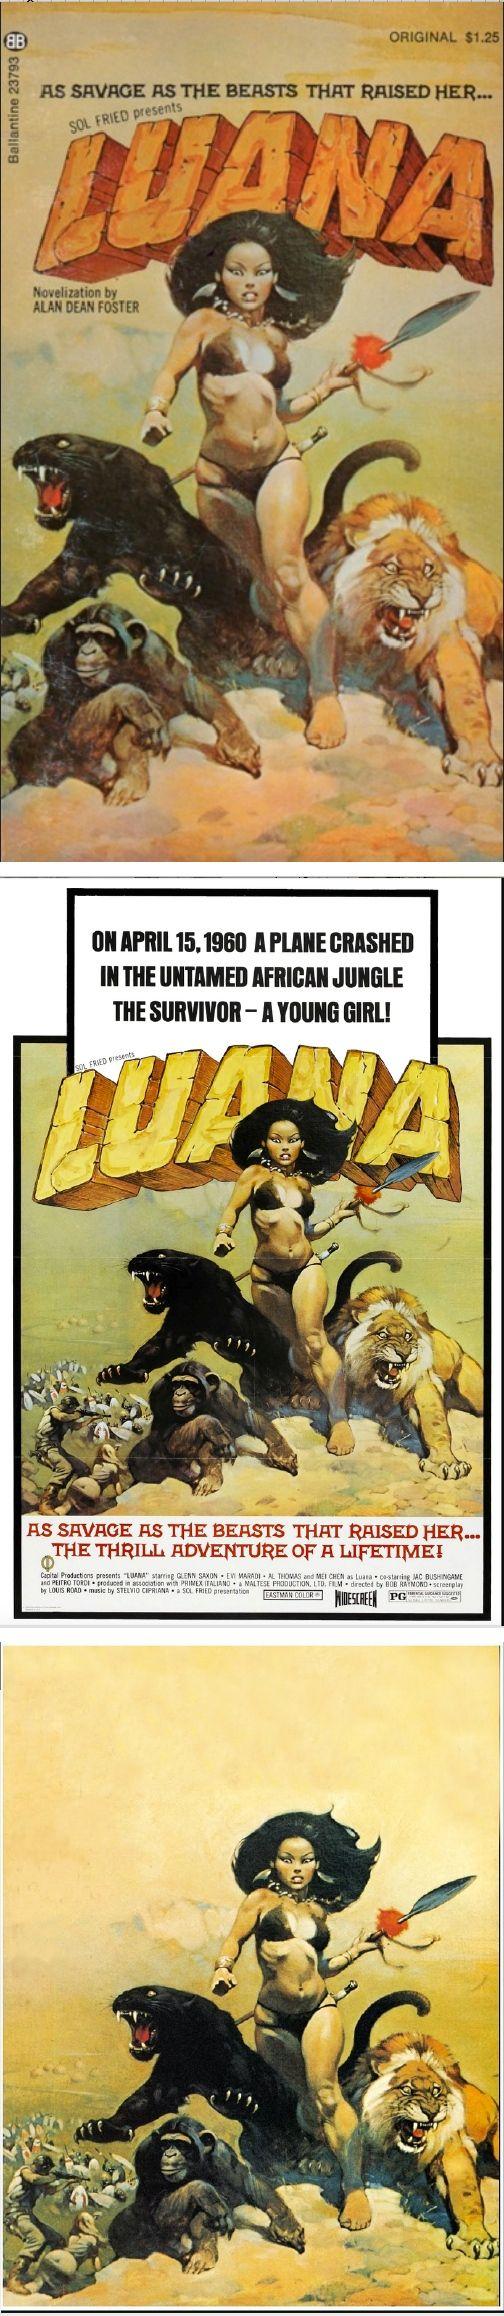 FRANK FRAZETTA - Luana by Alan Dean Foster - 1974 Ballantine Books - cover by isfdb - Luana, the Girl Tarzan - 1968 Italian/German film - print by stendec8.blogspot.com